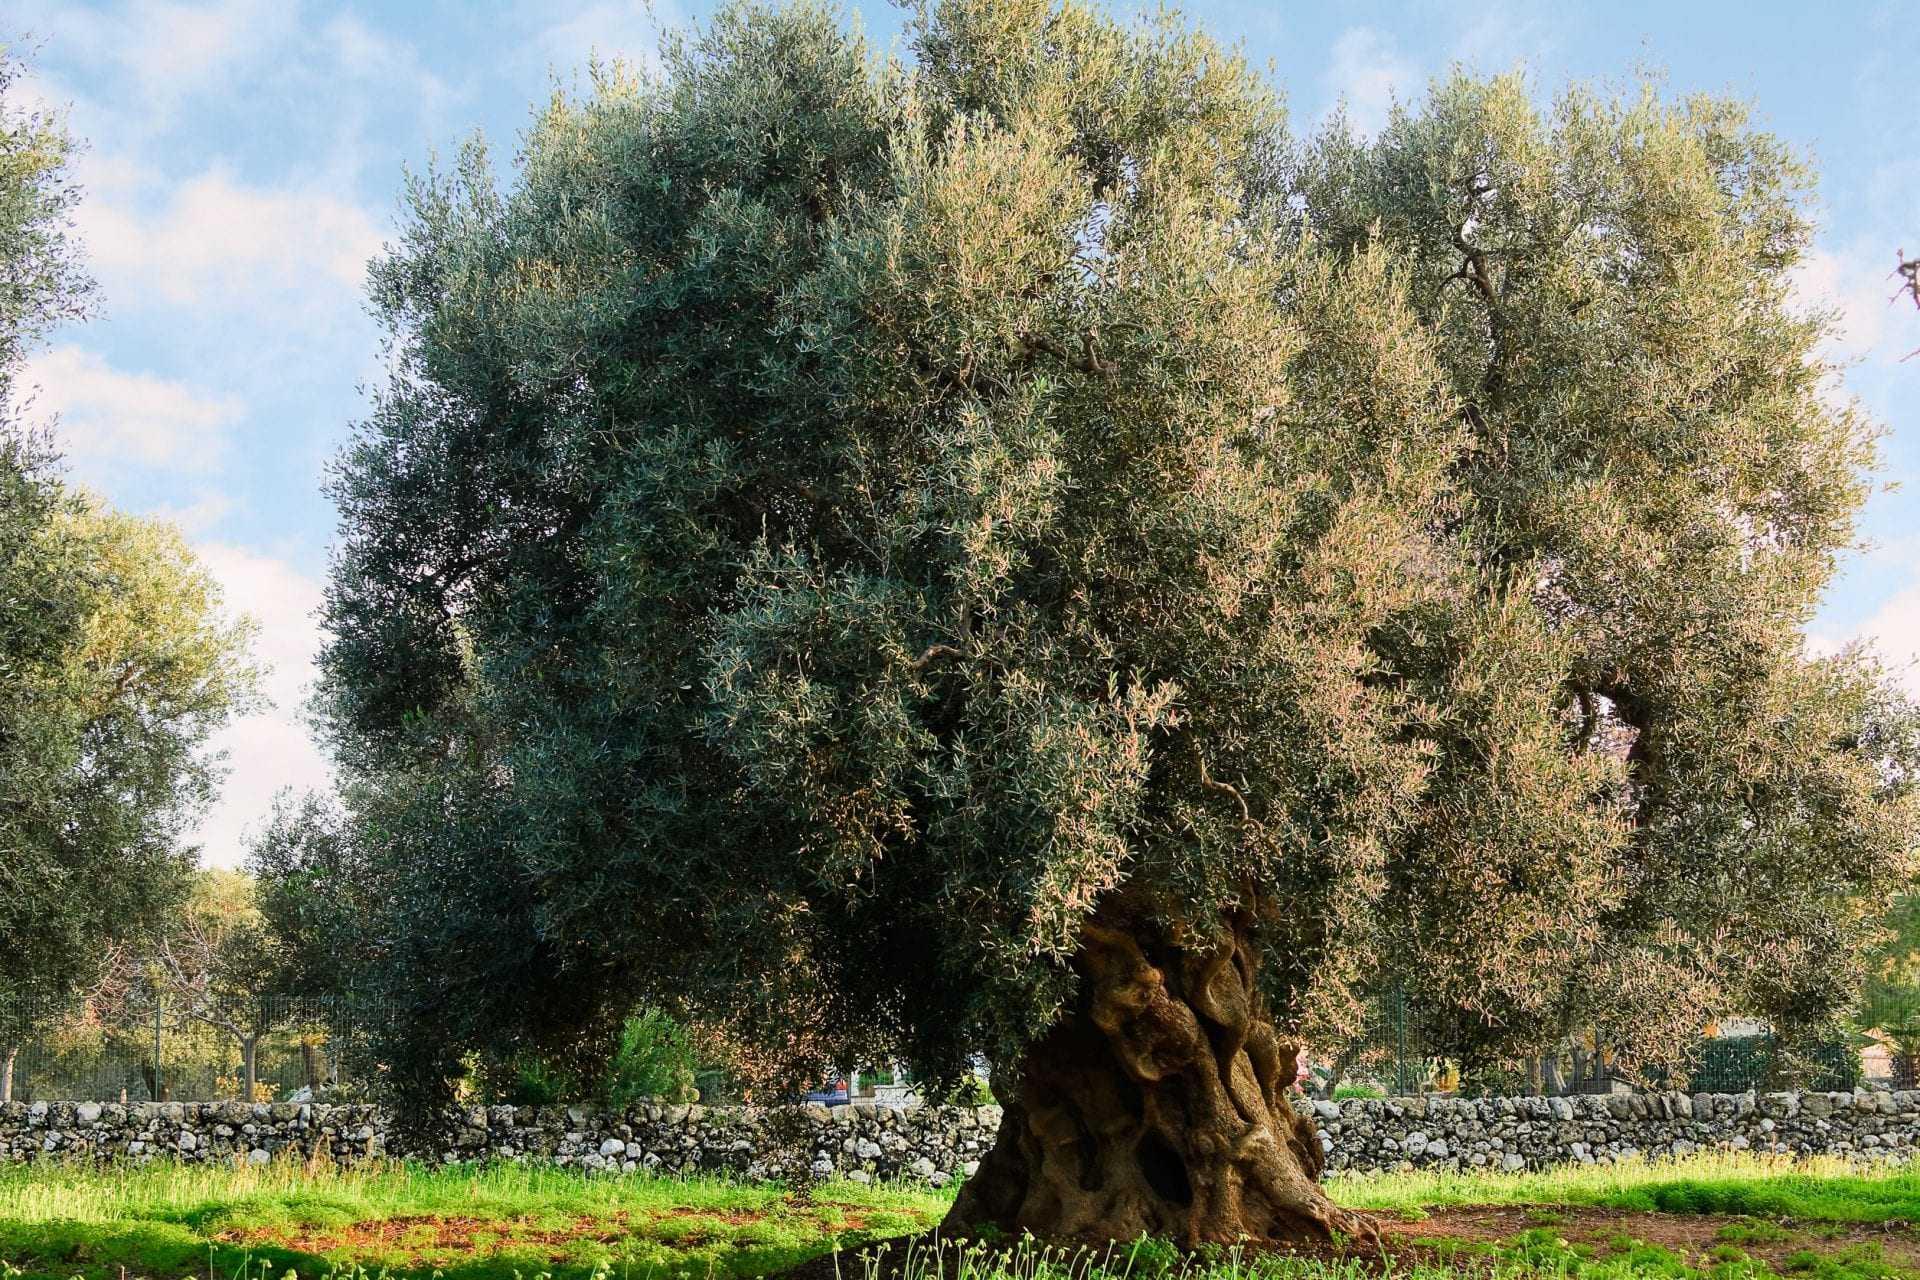 europe-briefs-latest-xylella-outbreak-in-puglia-continues-to-spread-olive-oil-times